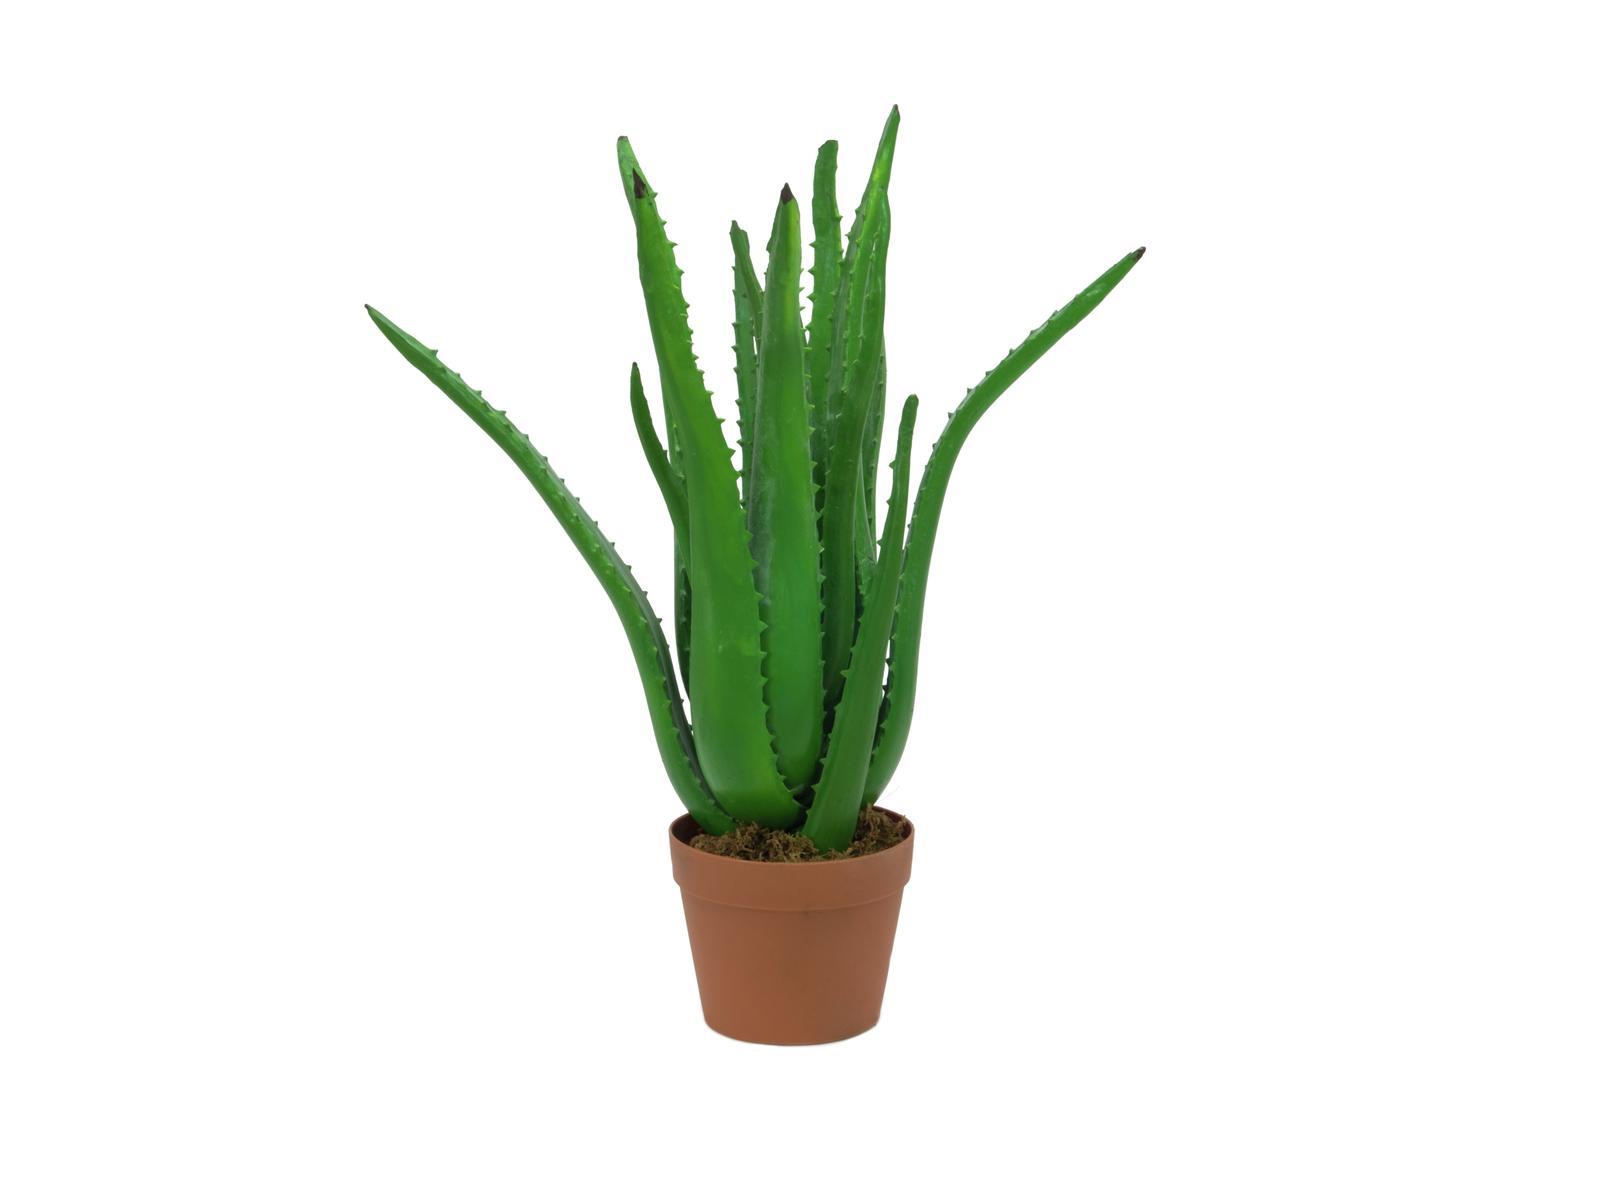 EUROPALMS Aloe-Vera-Pflanze, Kunstpflanze, 63cm